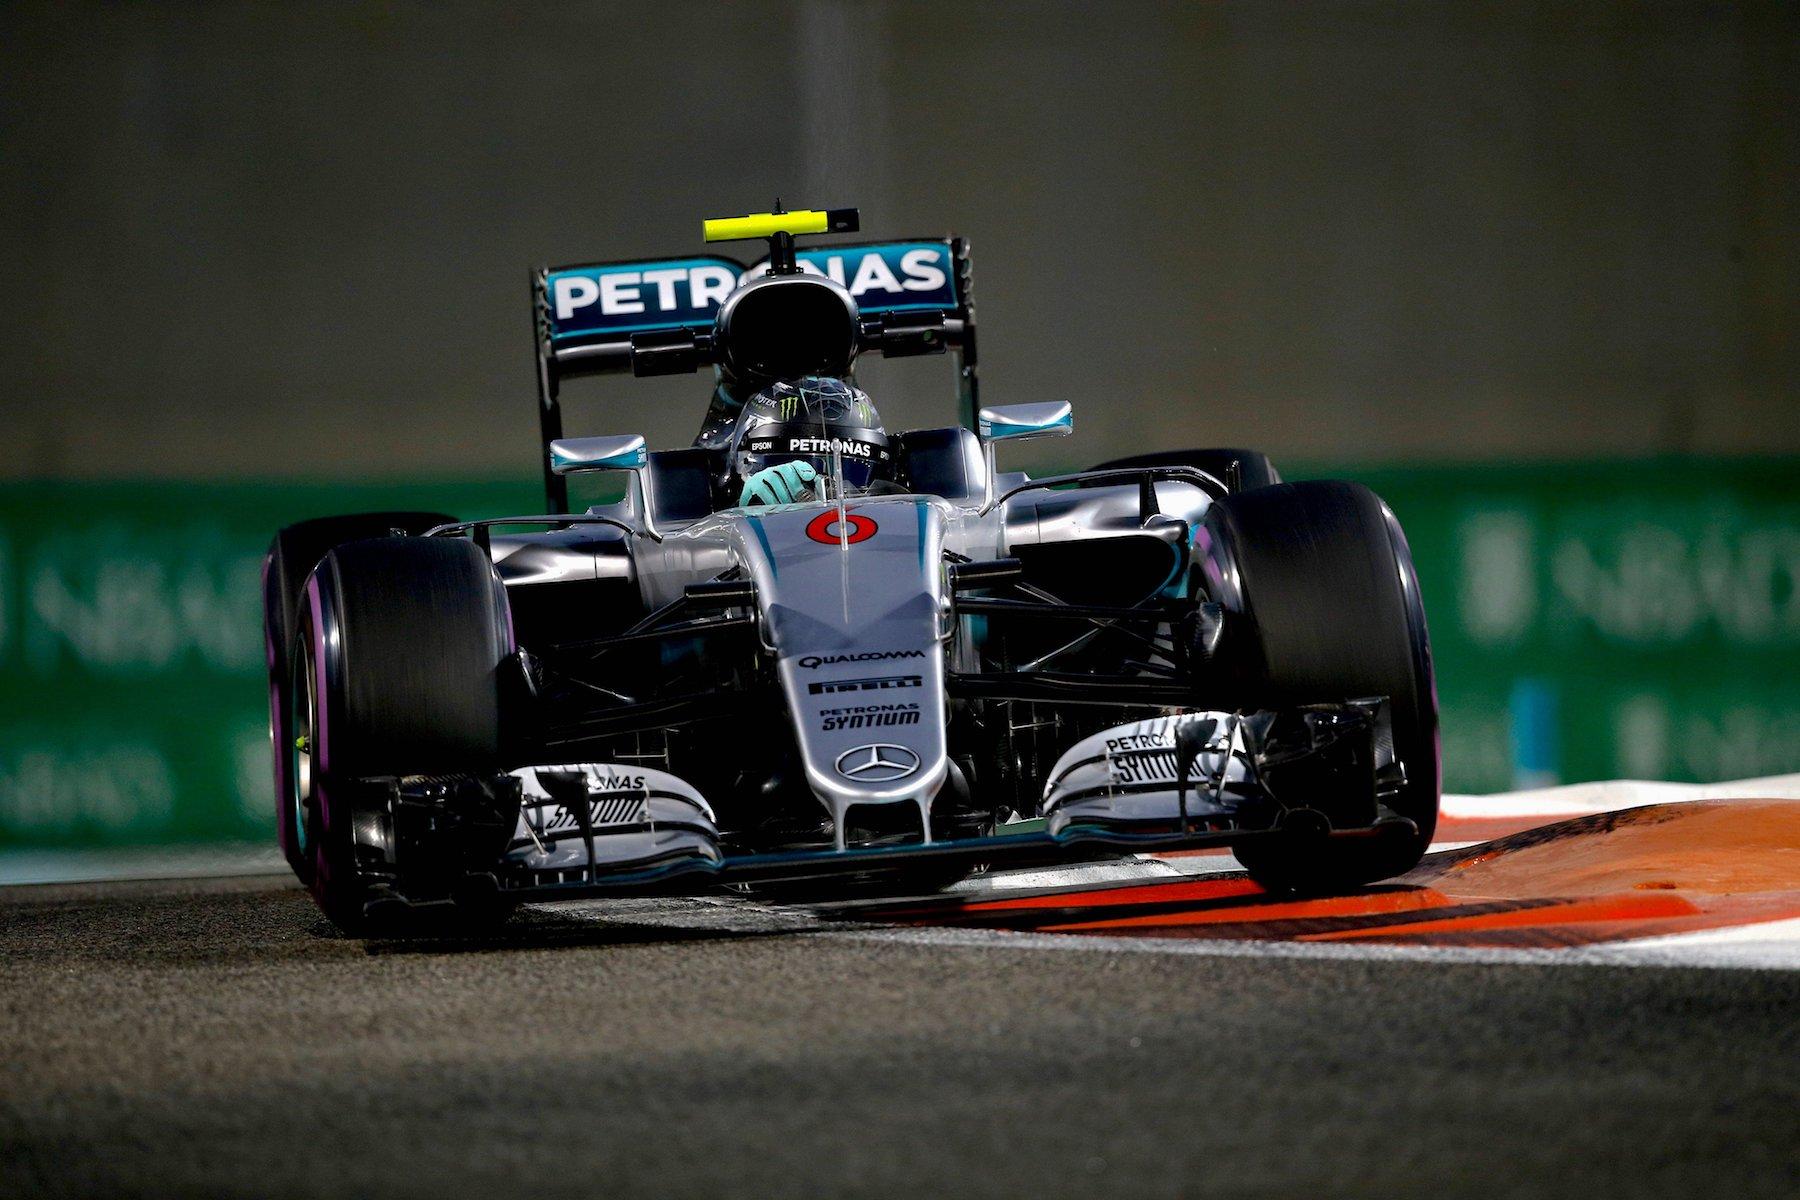 Salracing - Nico Rosberg | Mercedes AMG Petronas